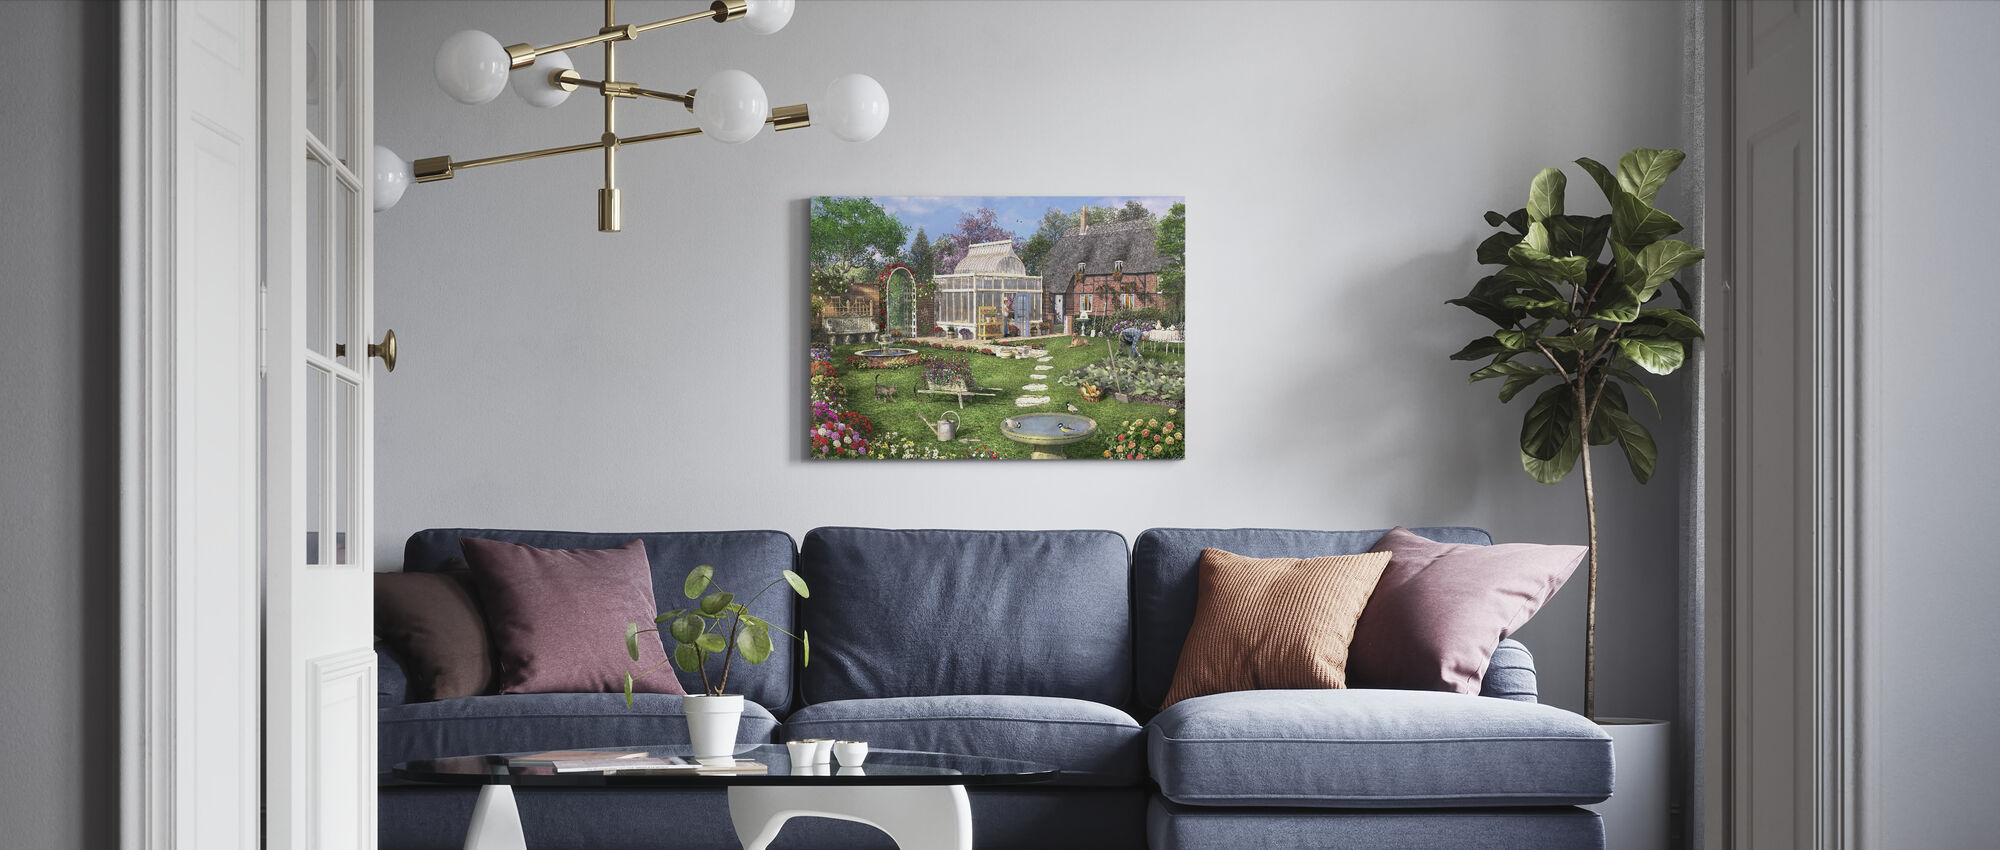 De Cottage Tuin - Canvas print - Woonkamer